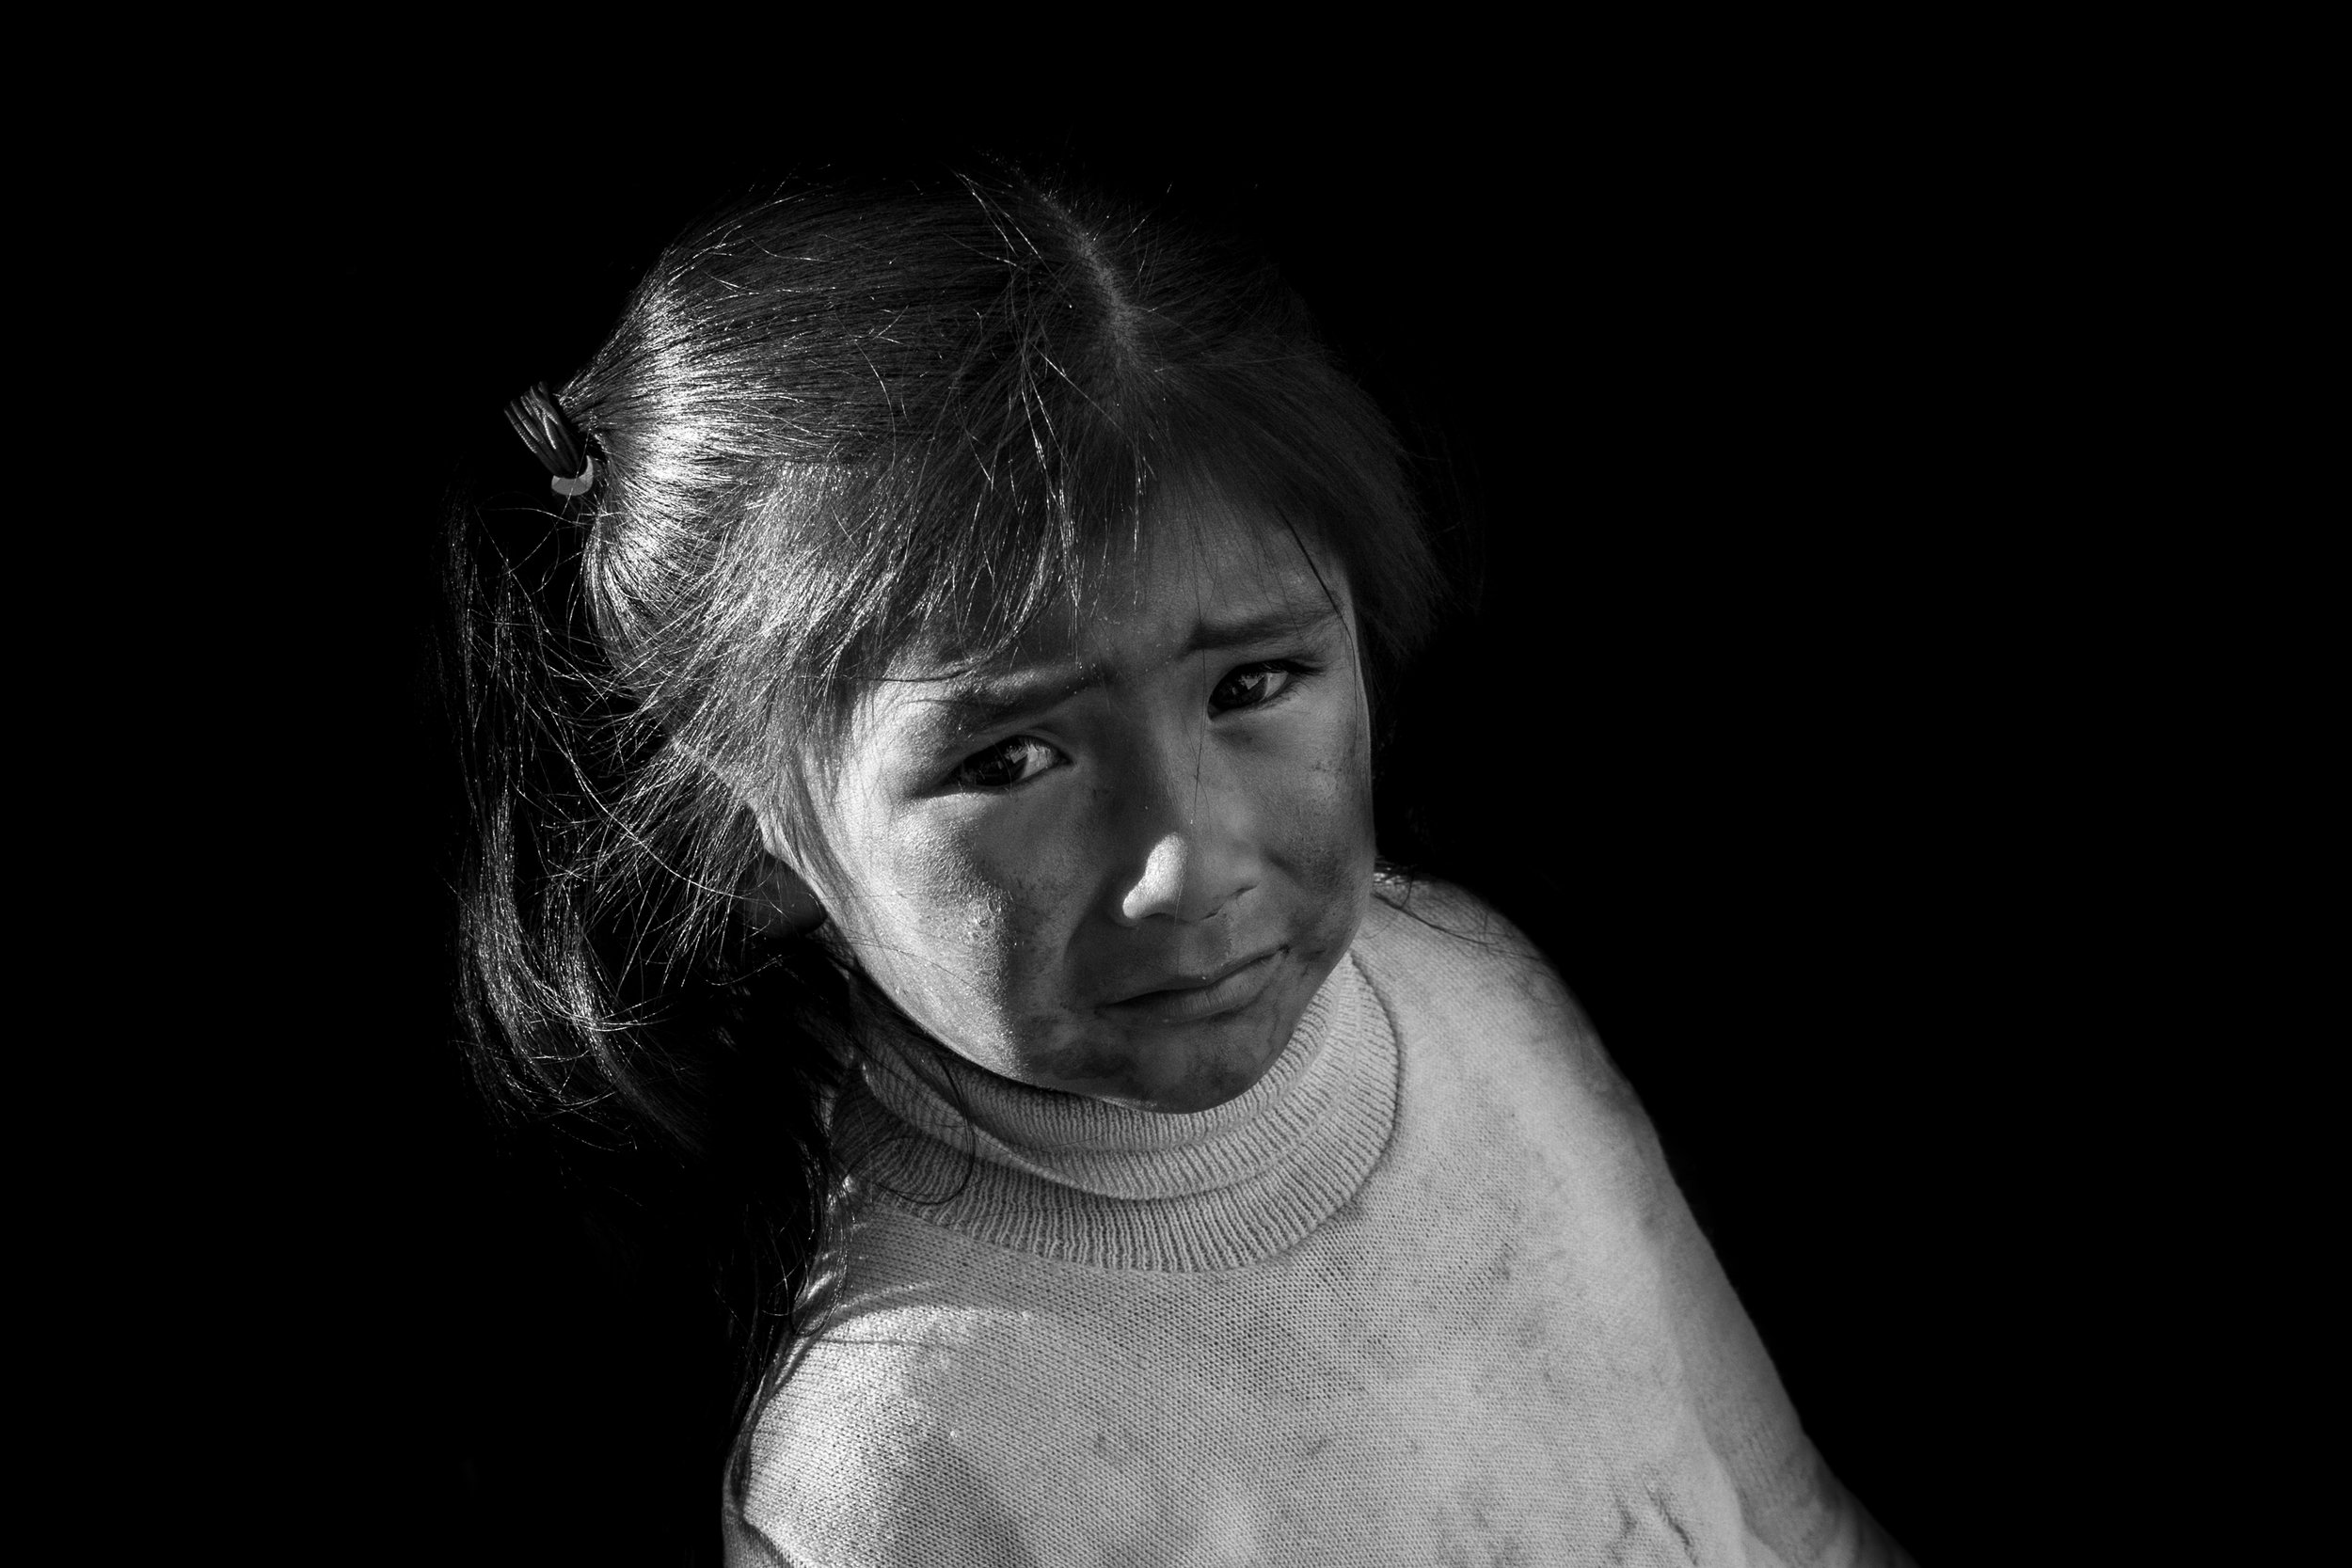 Ffotogallery Platform Instagram Takeover by Geraint Rowland - Candid child portraits, Cusco, Peru.